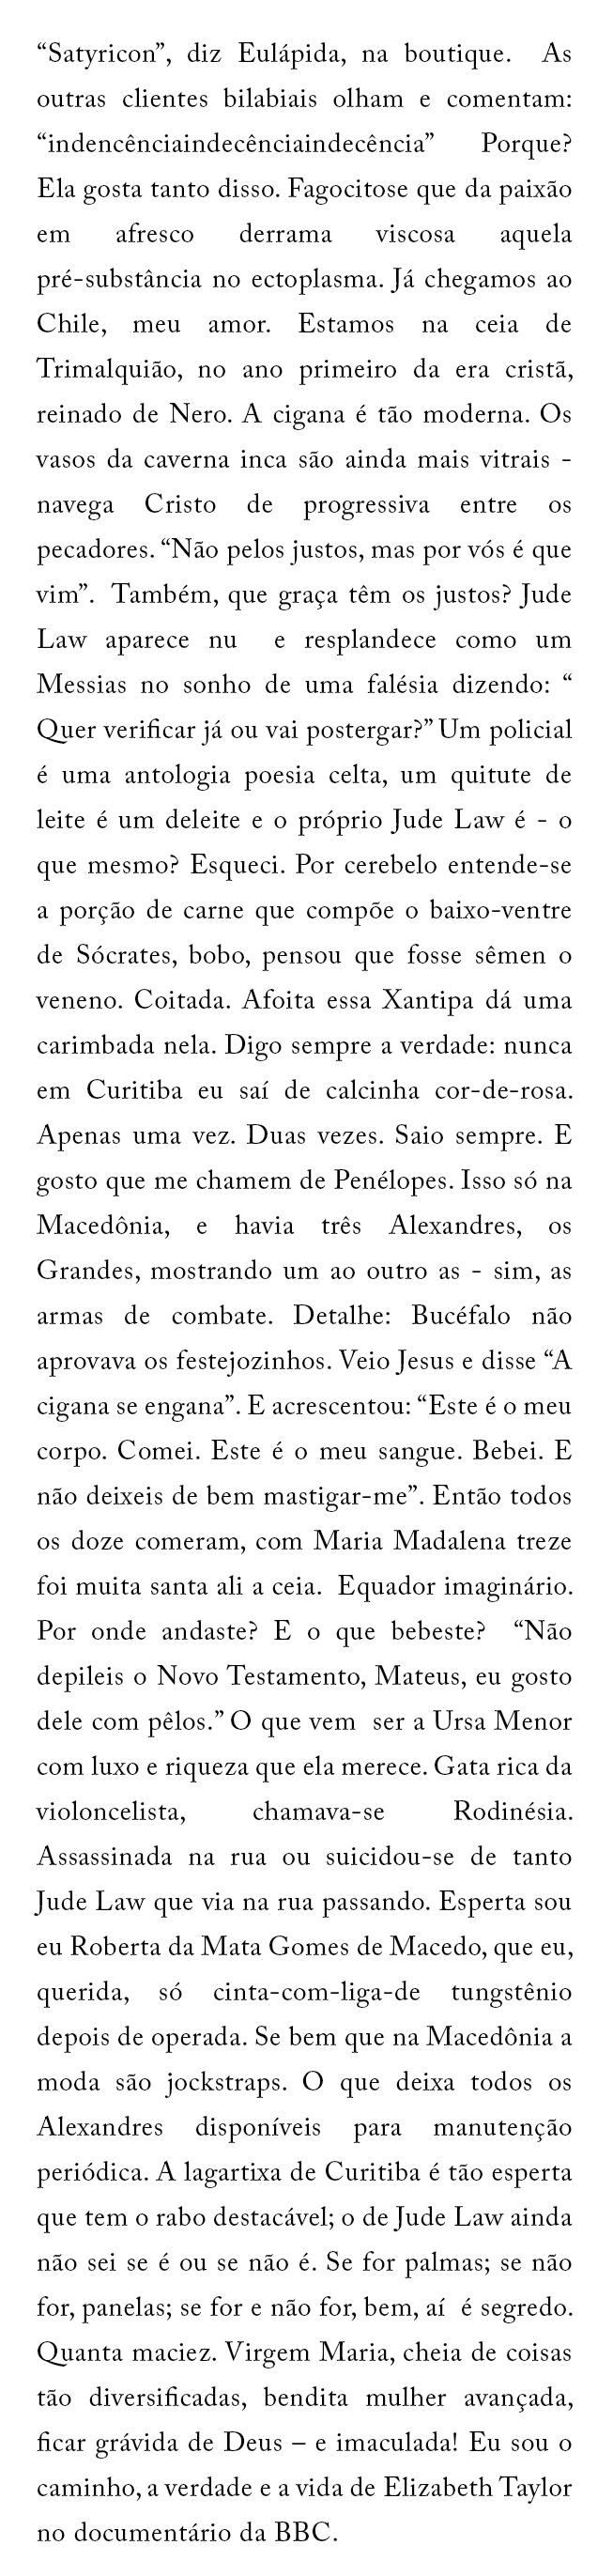 text | curitiba | Roberta Gomes de Macedo